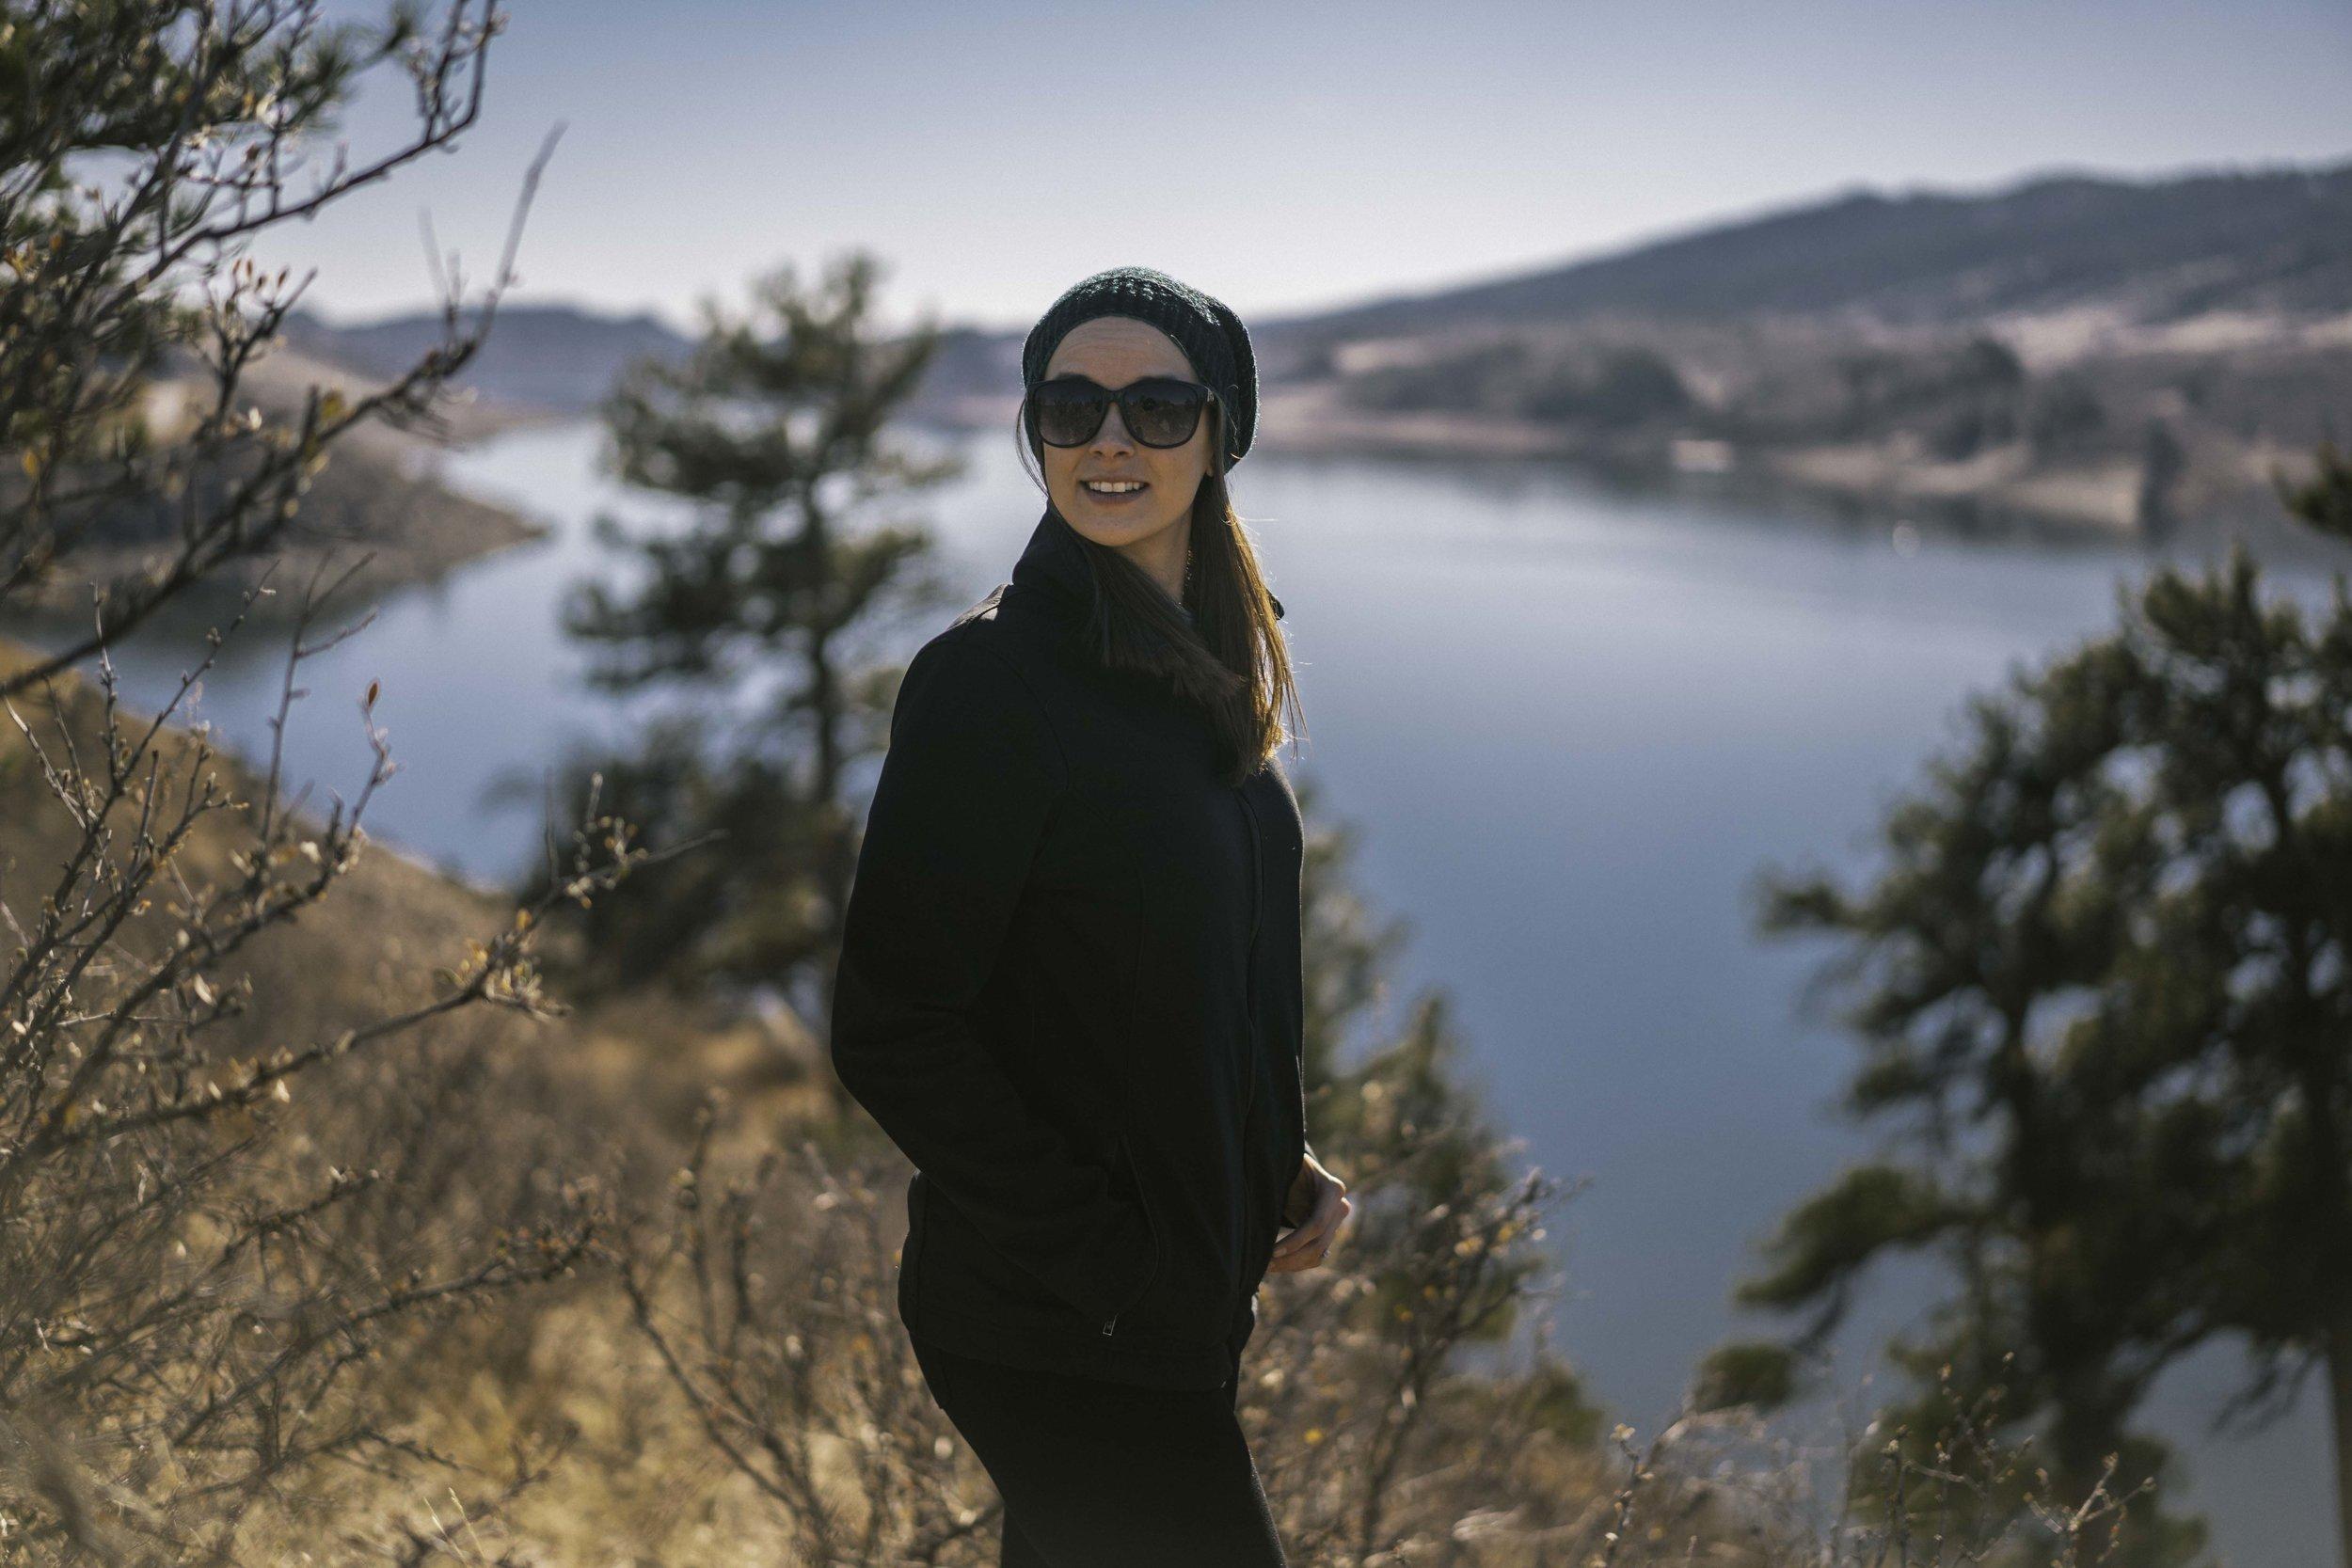 Horsetooth Reservoir, Fort Collins, Colorado